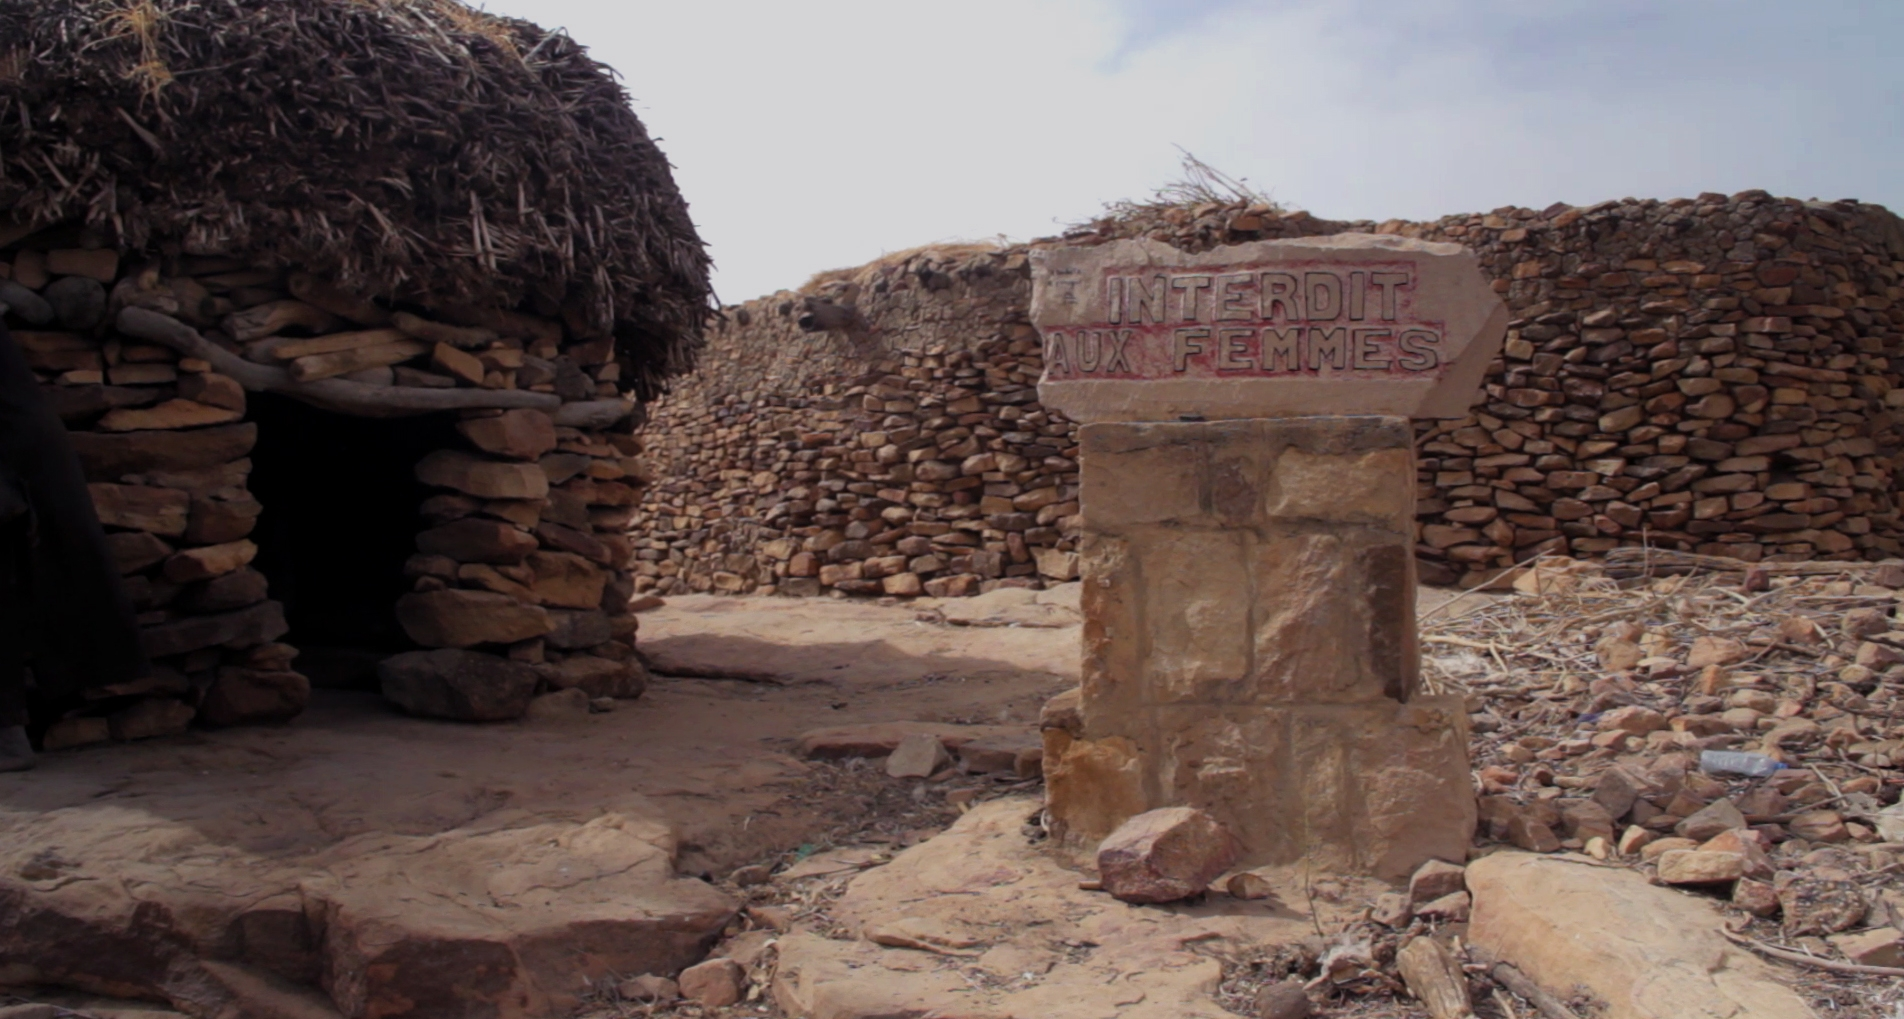 toguina dogon pablocaminante - Malí 5, País Dogon II: Djiguibombó